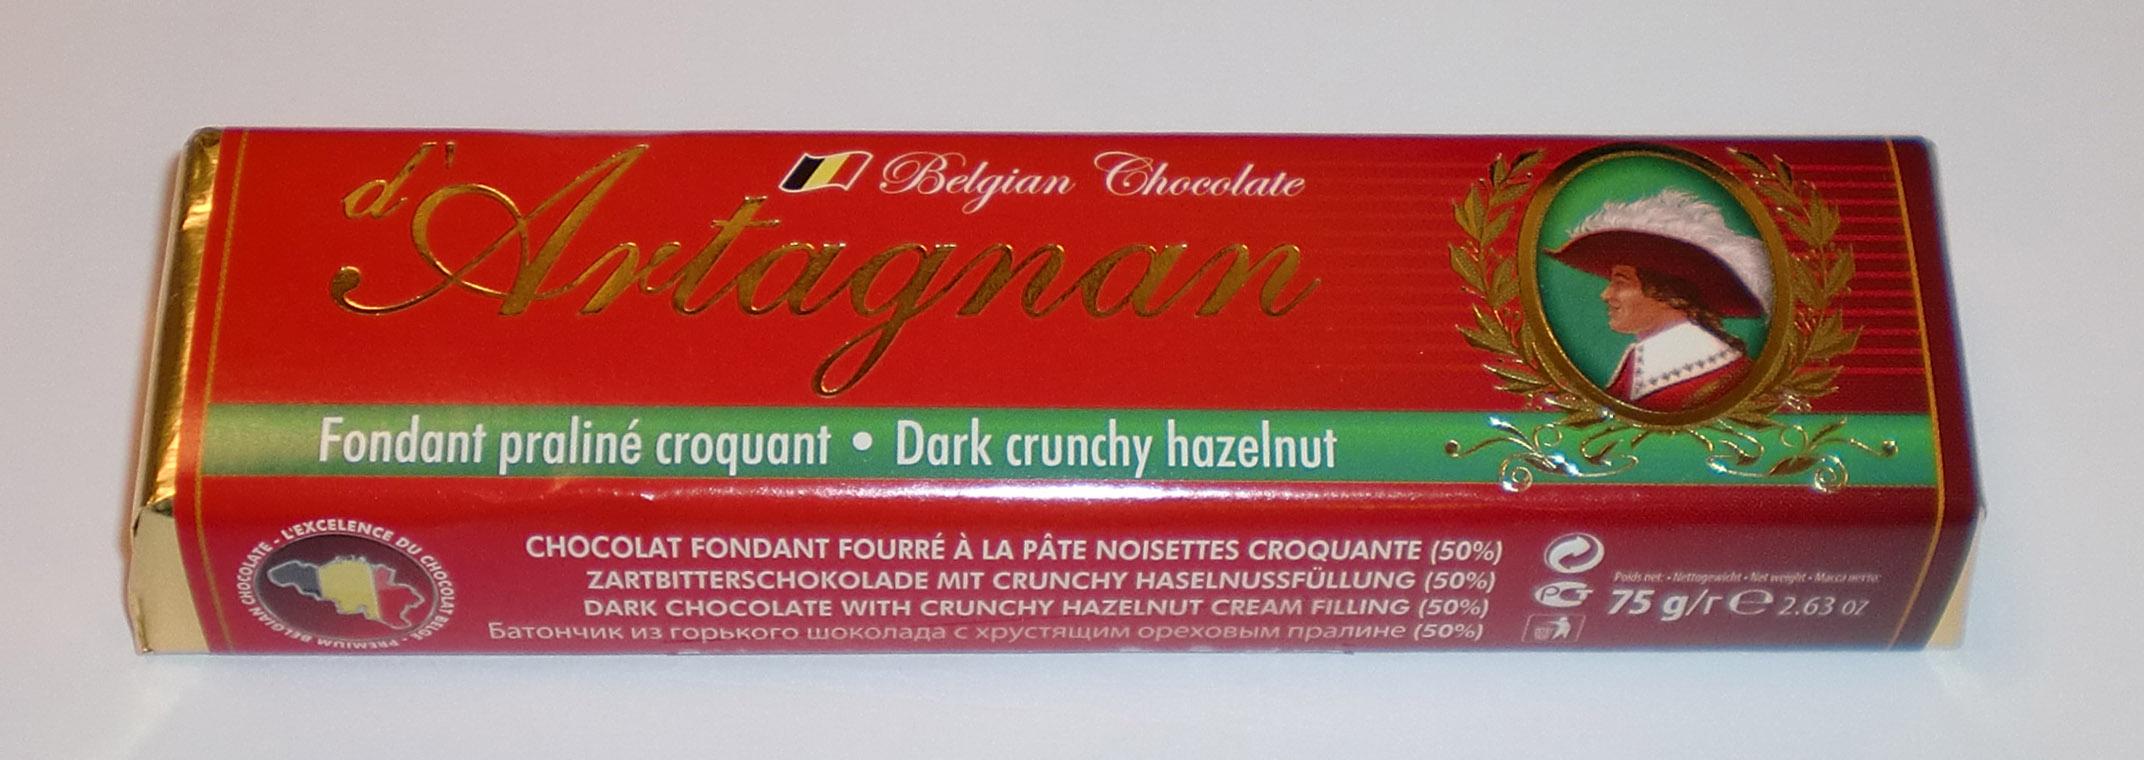 D1270_-_Chocolat_fondant_praliné_croquant.jpg